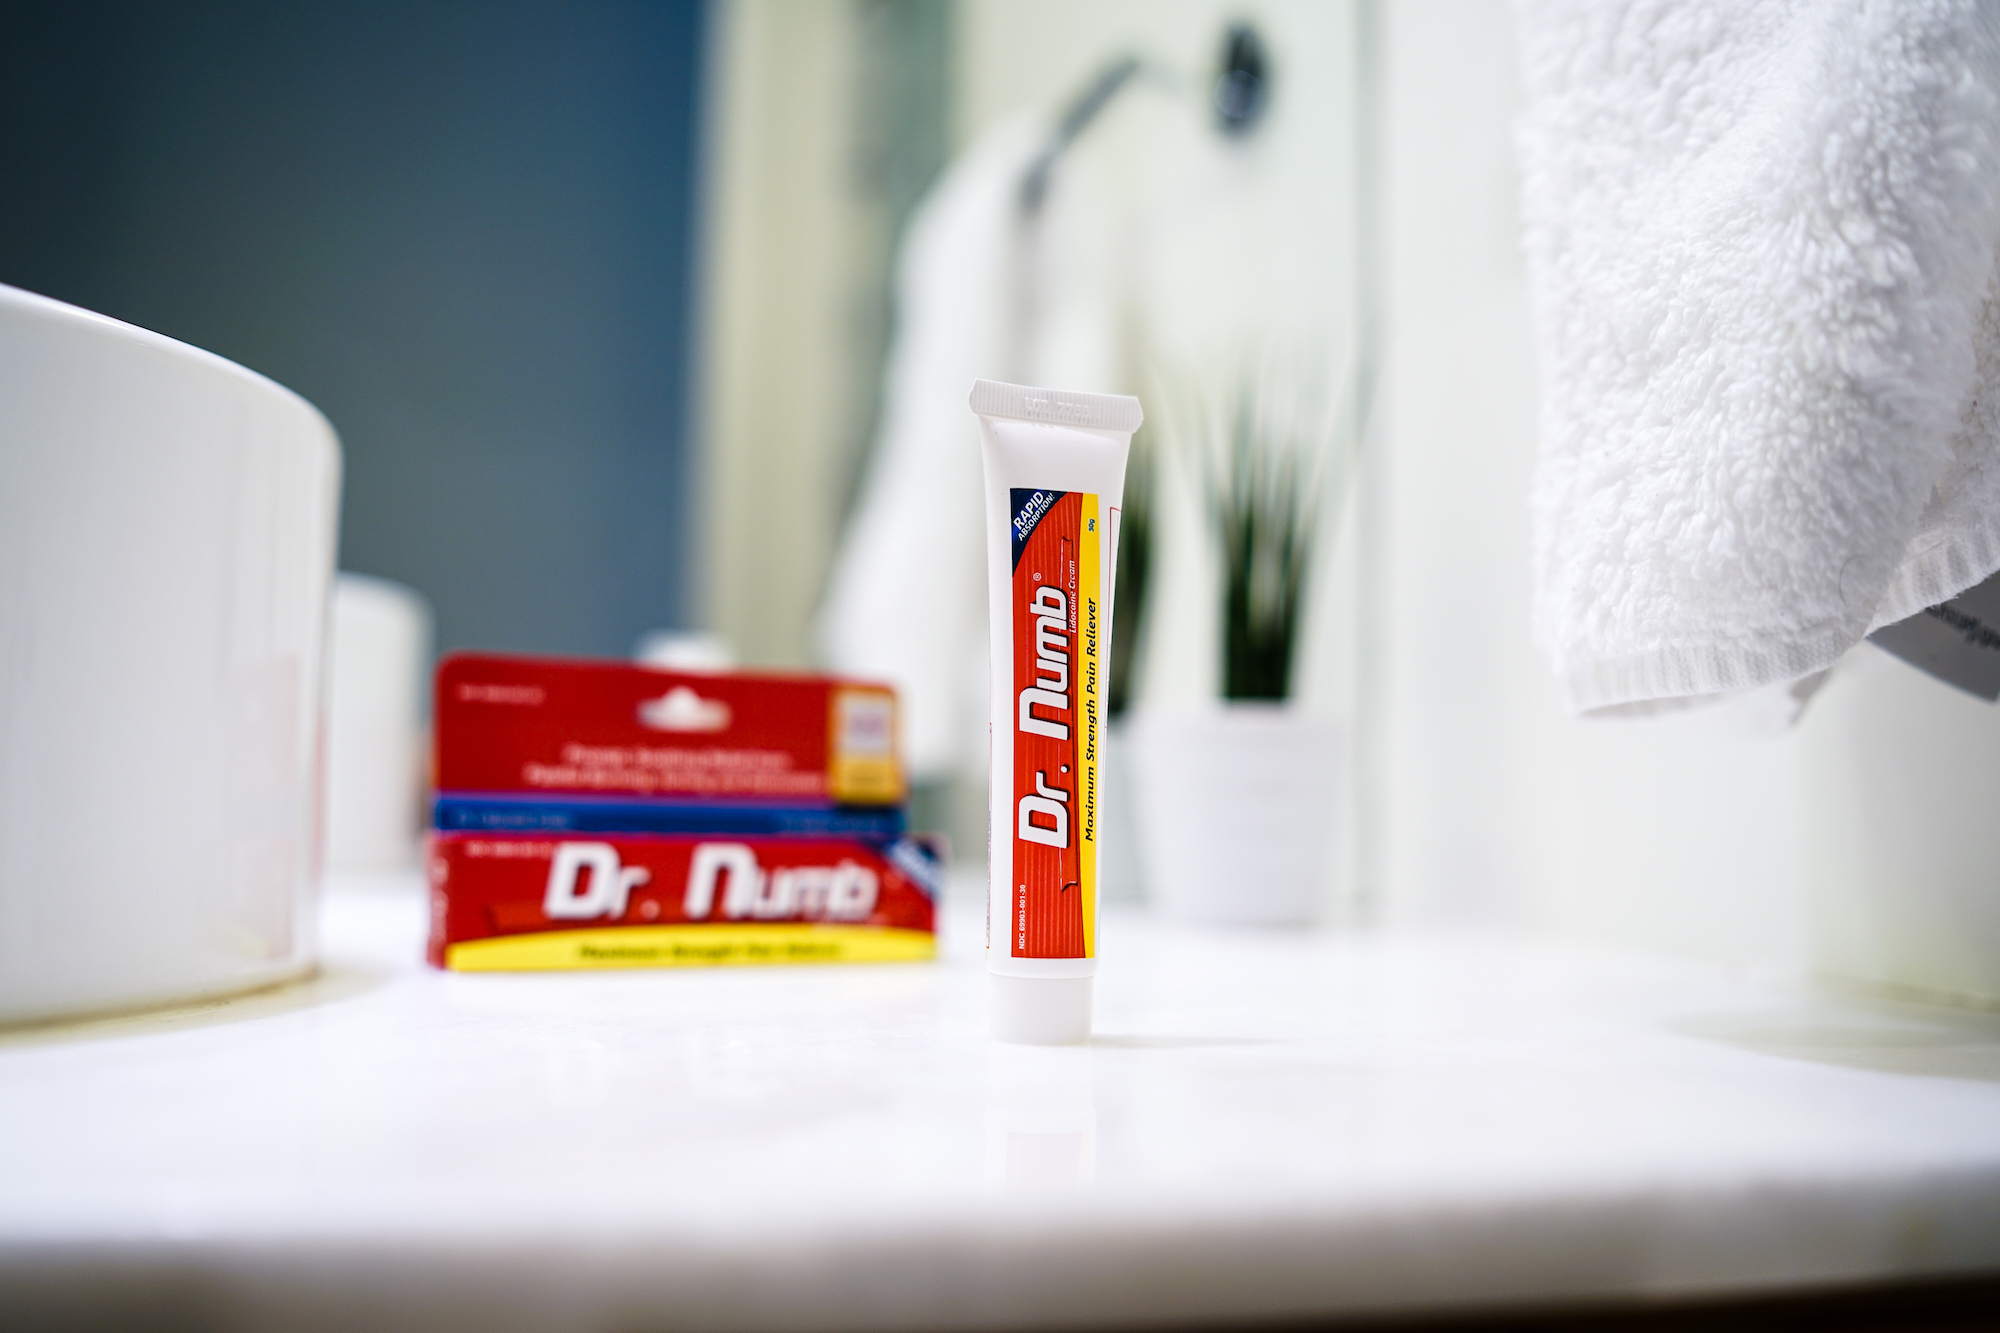 DrNumb-Microblading-29 copy.jpg